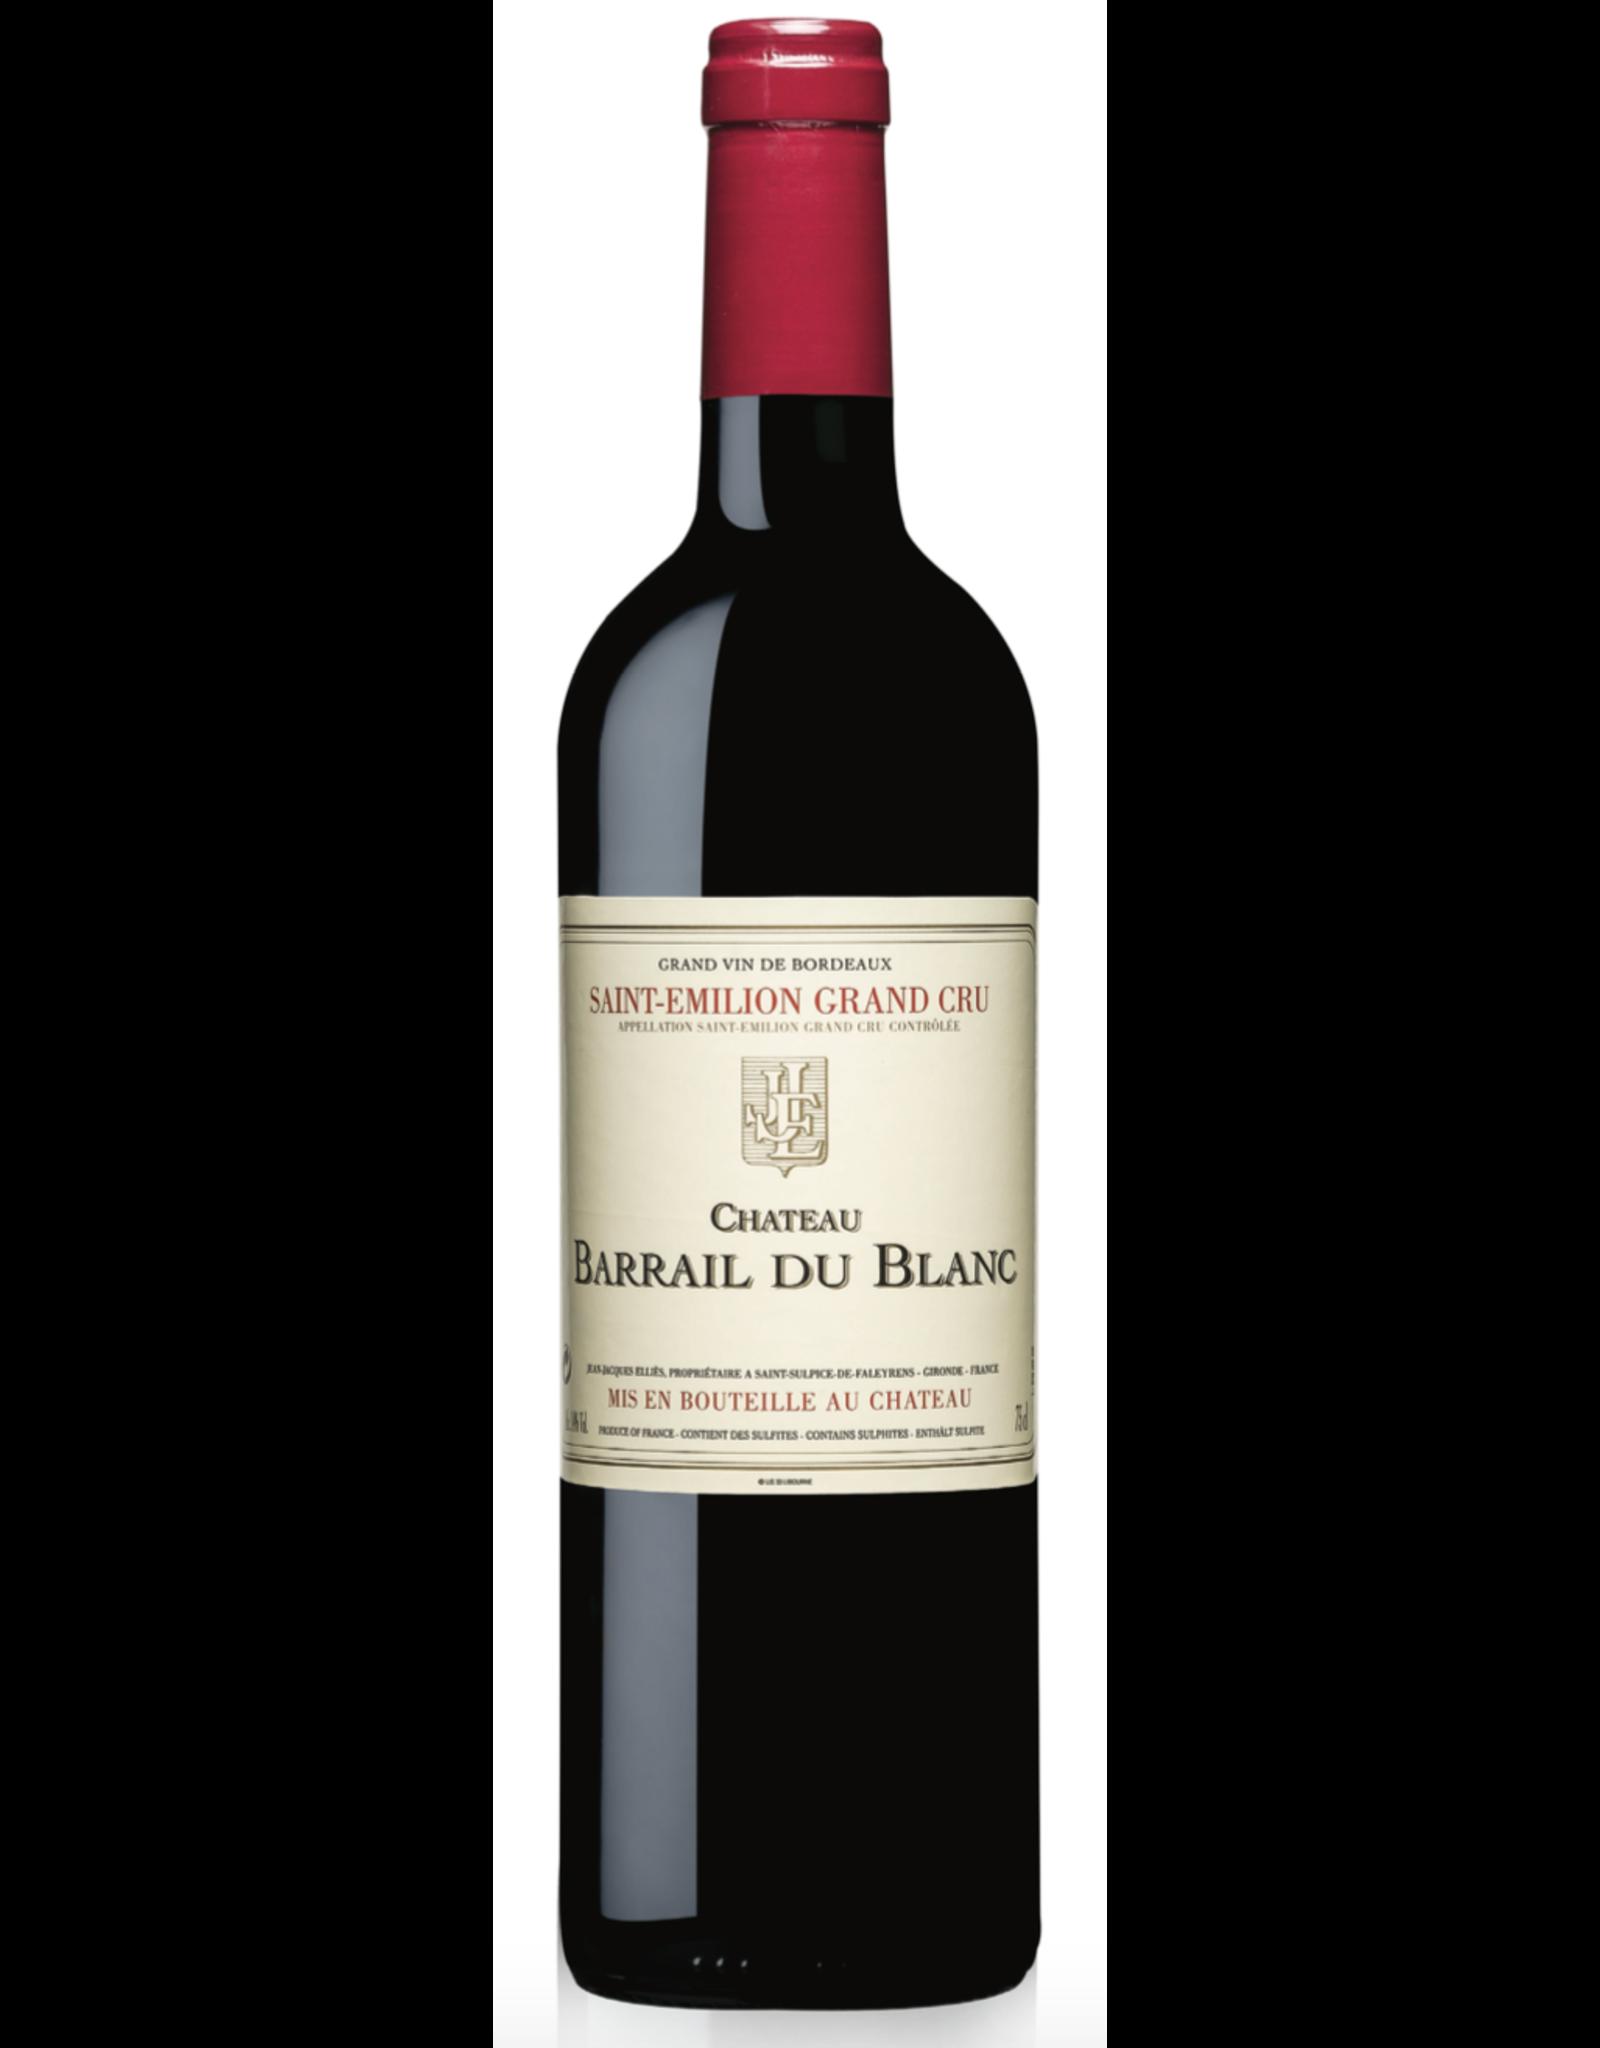 Château Barrail du Blanc Château Barail du Blanc 2018 - St.Emilion